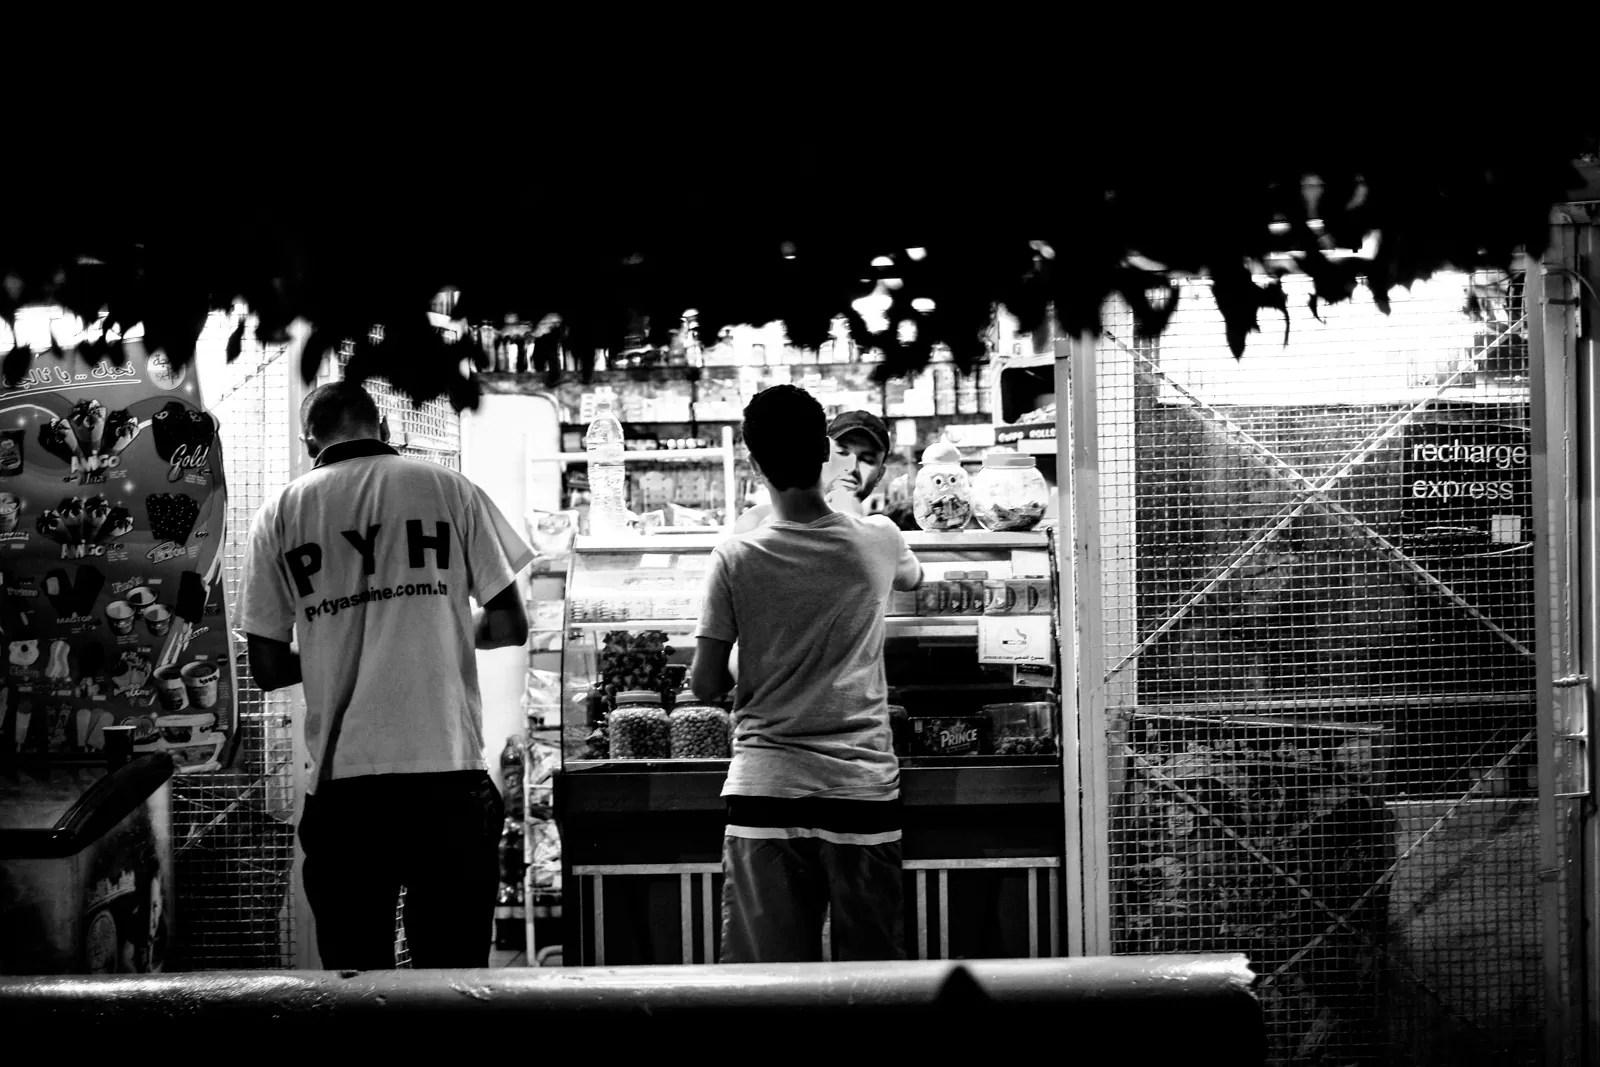 DSCF3203 - Chi è lo street photographer? - fotostreet.it